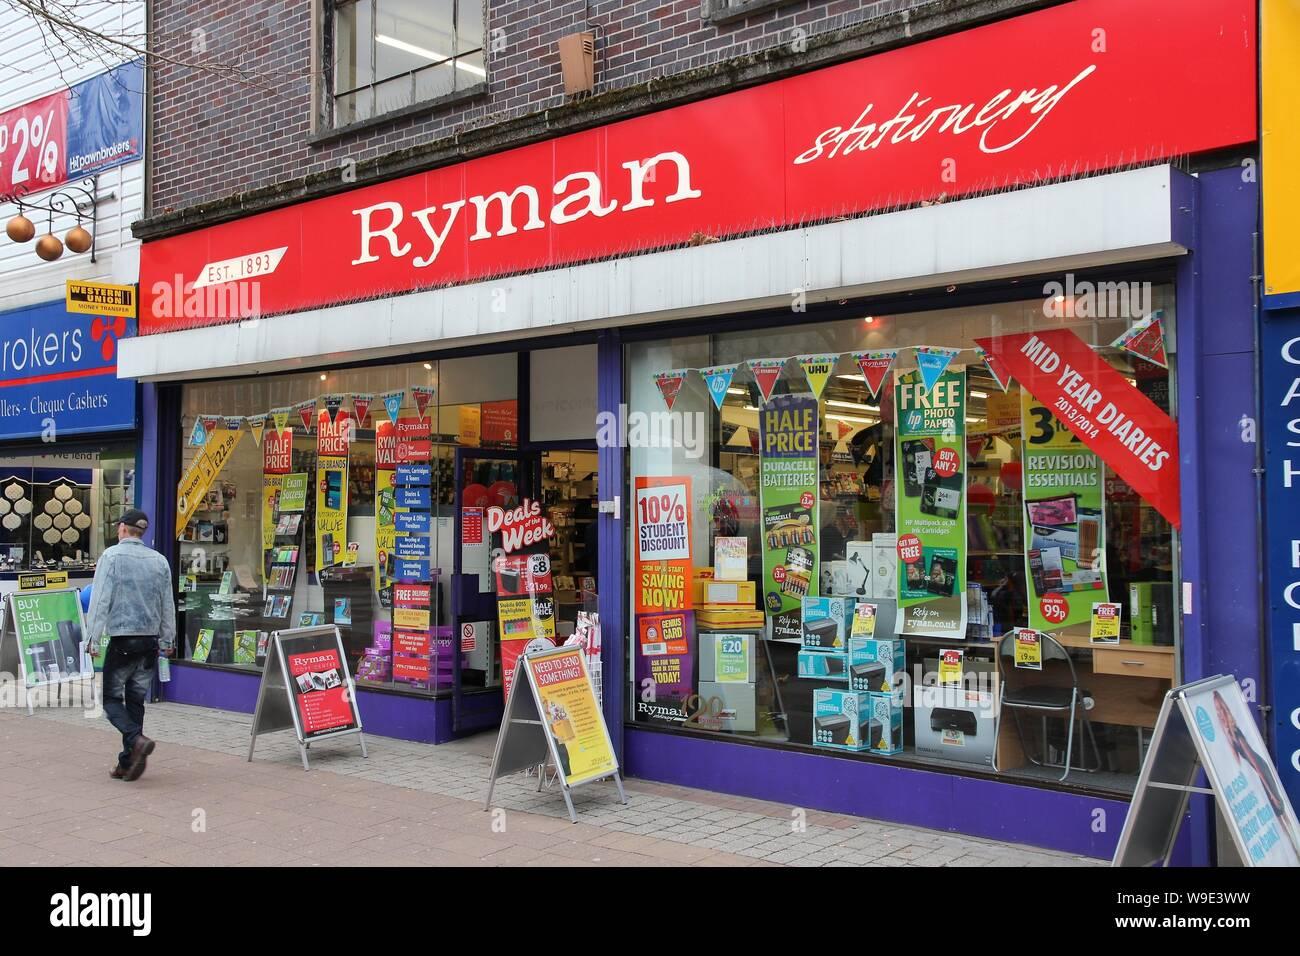 Ryman Stationery Store Stock Photos & Ryman Stationery Store